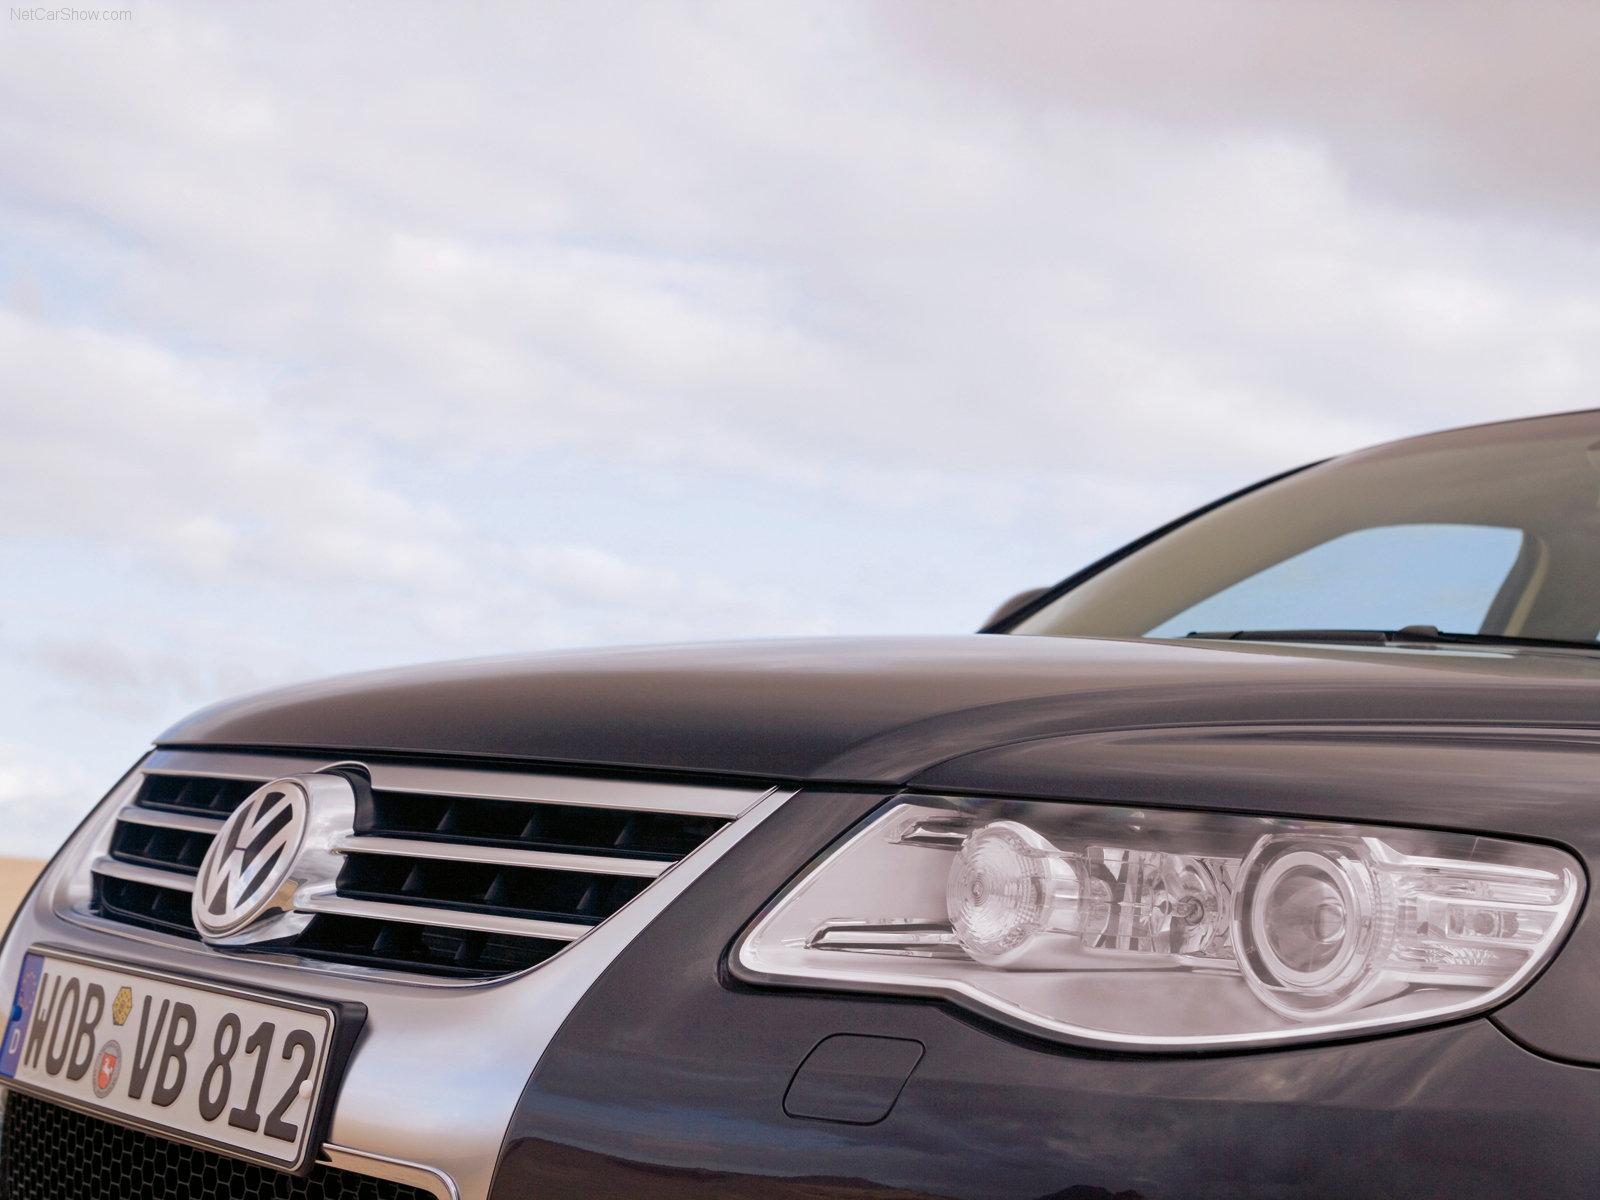 http://w04.ru/foto/Volkswagen-Touareg_2007_1600x1200_wallpaper_21.jpg